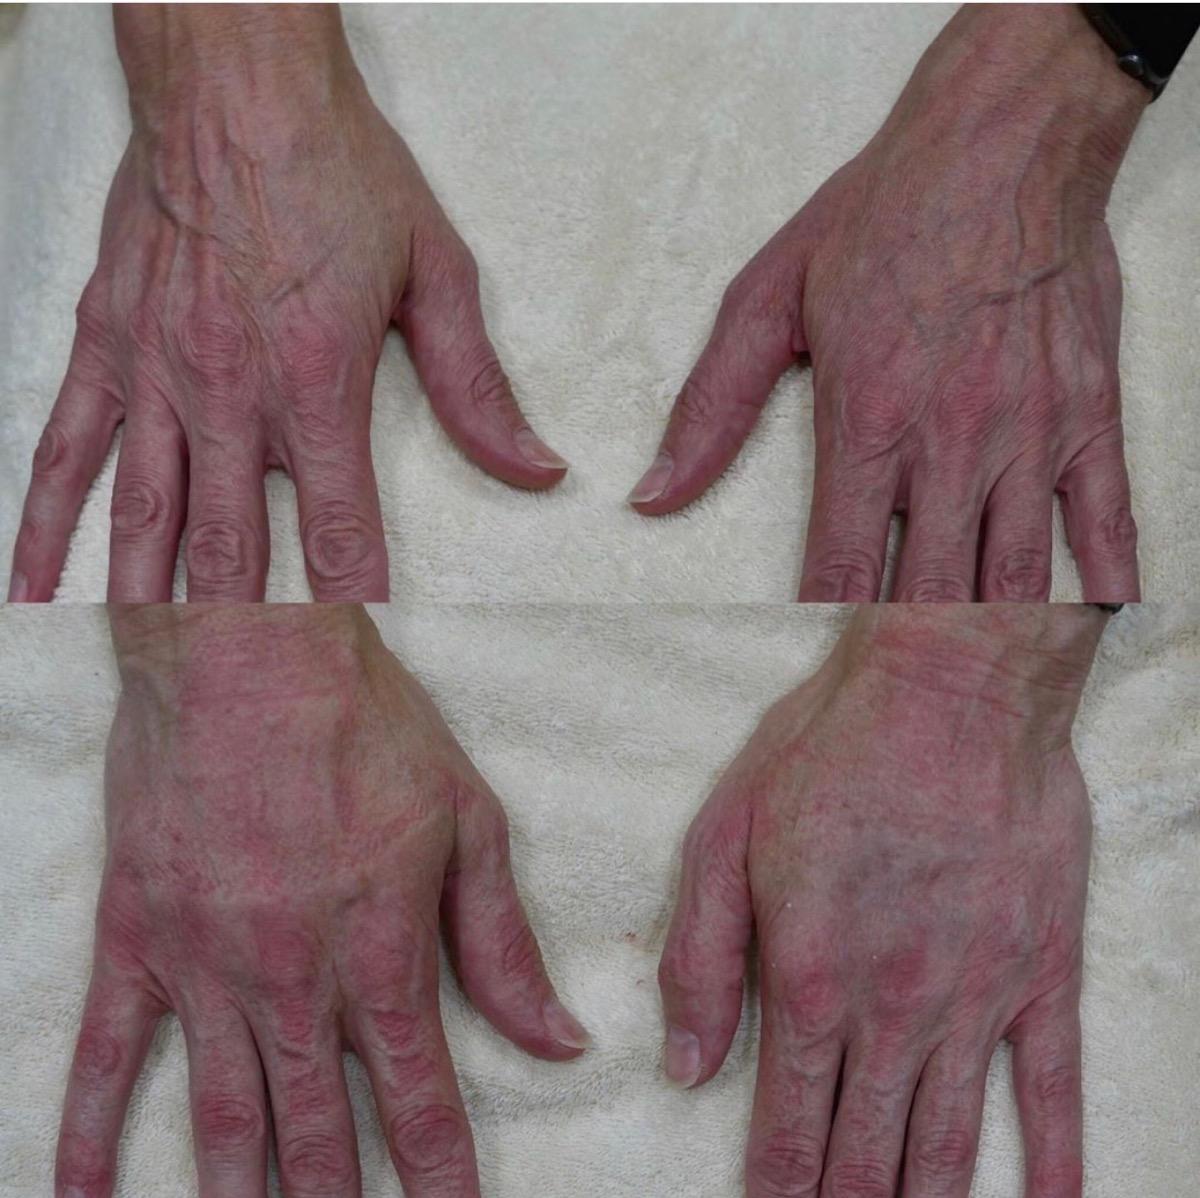 Hand Gallery - Patient 3199419 - Image 5